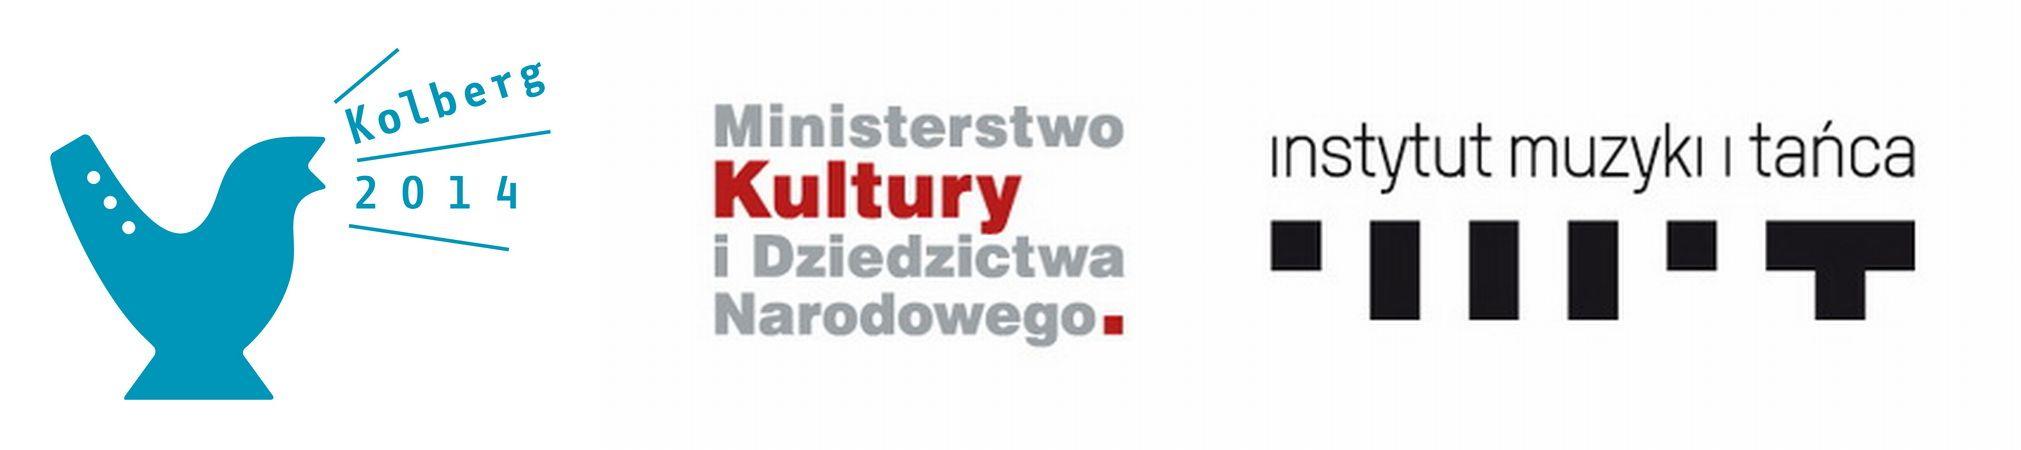 http://m.wm.pl/2014/11/orig/kultura-218910.jpg